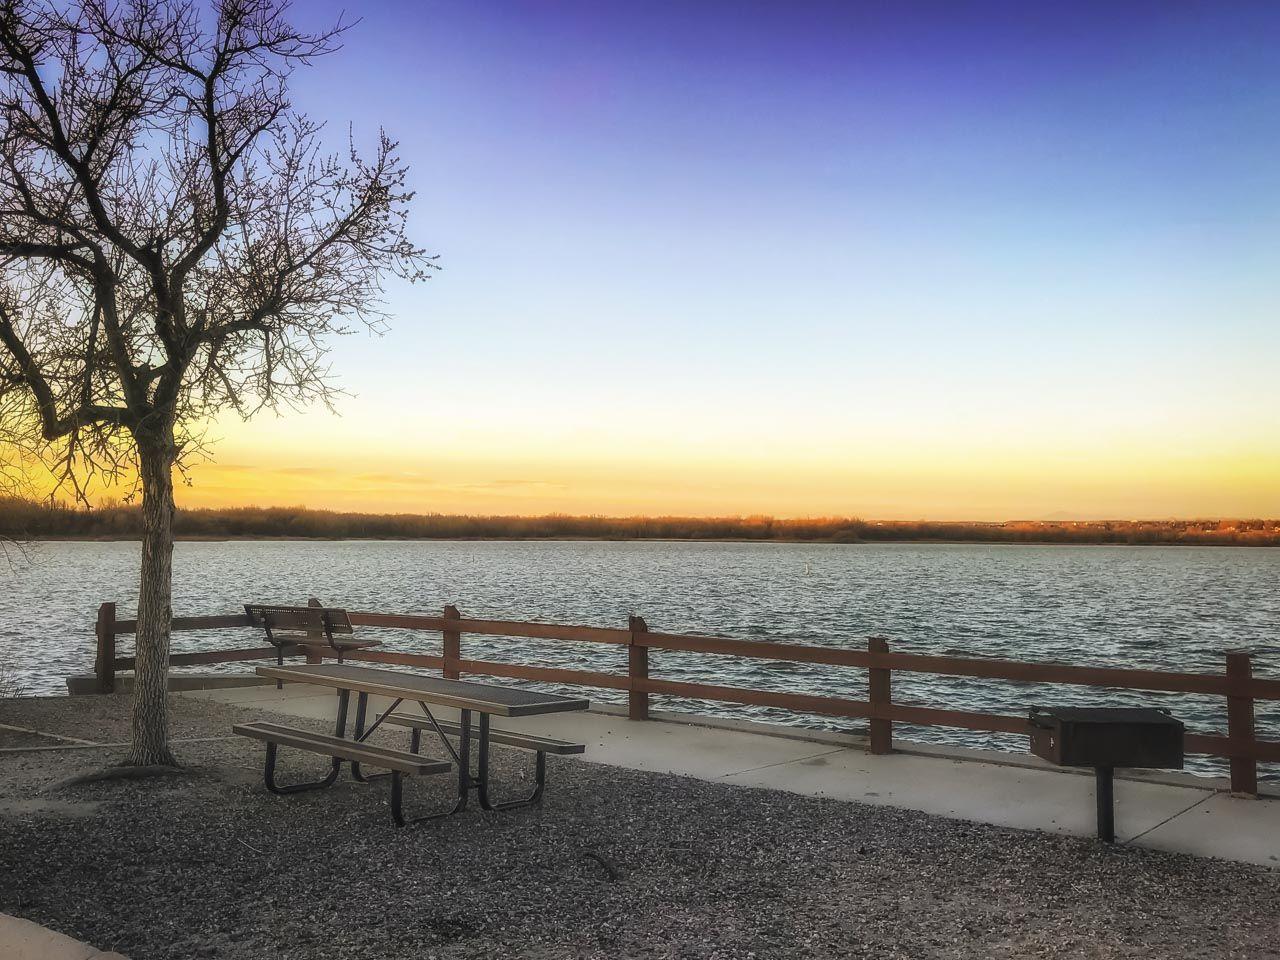 Aurora Colorado Cherry Creek Park lake